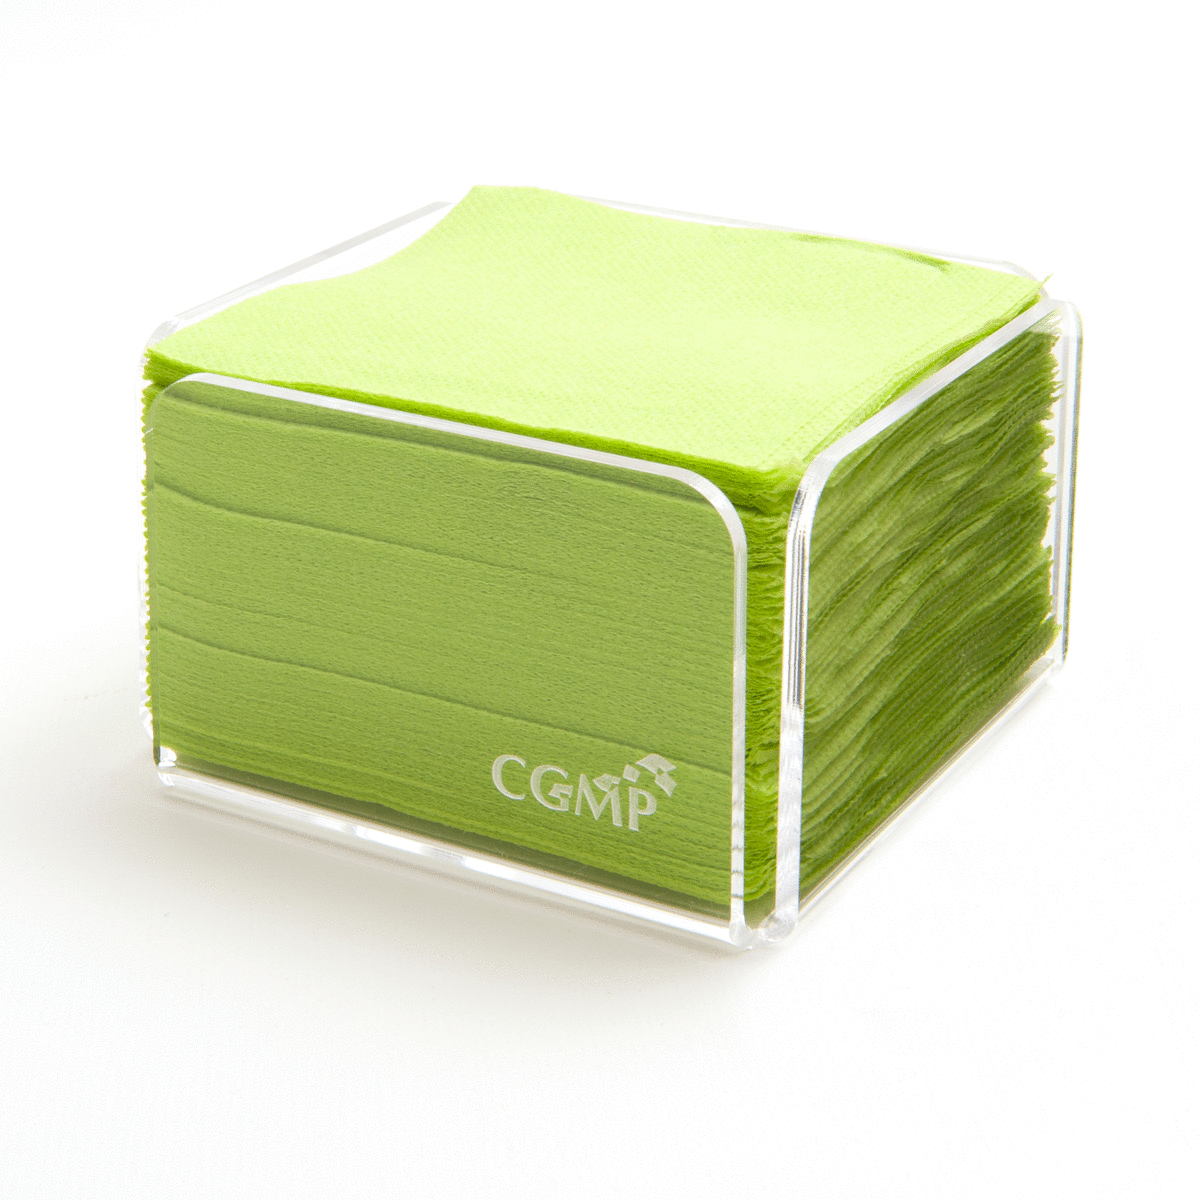 Serviette pistache ouate de cellulose 20x20 cm Celi Ouate Cgmp (100 pièces)